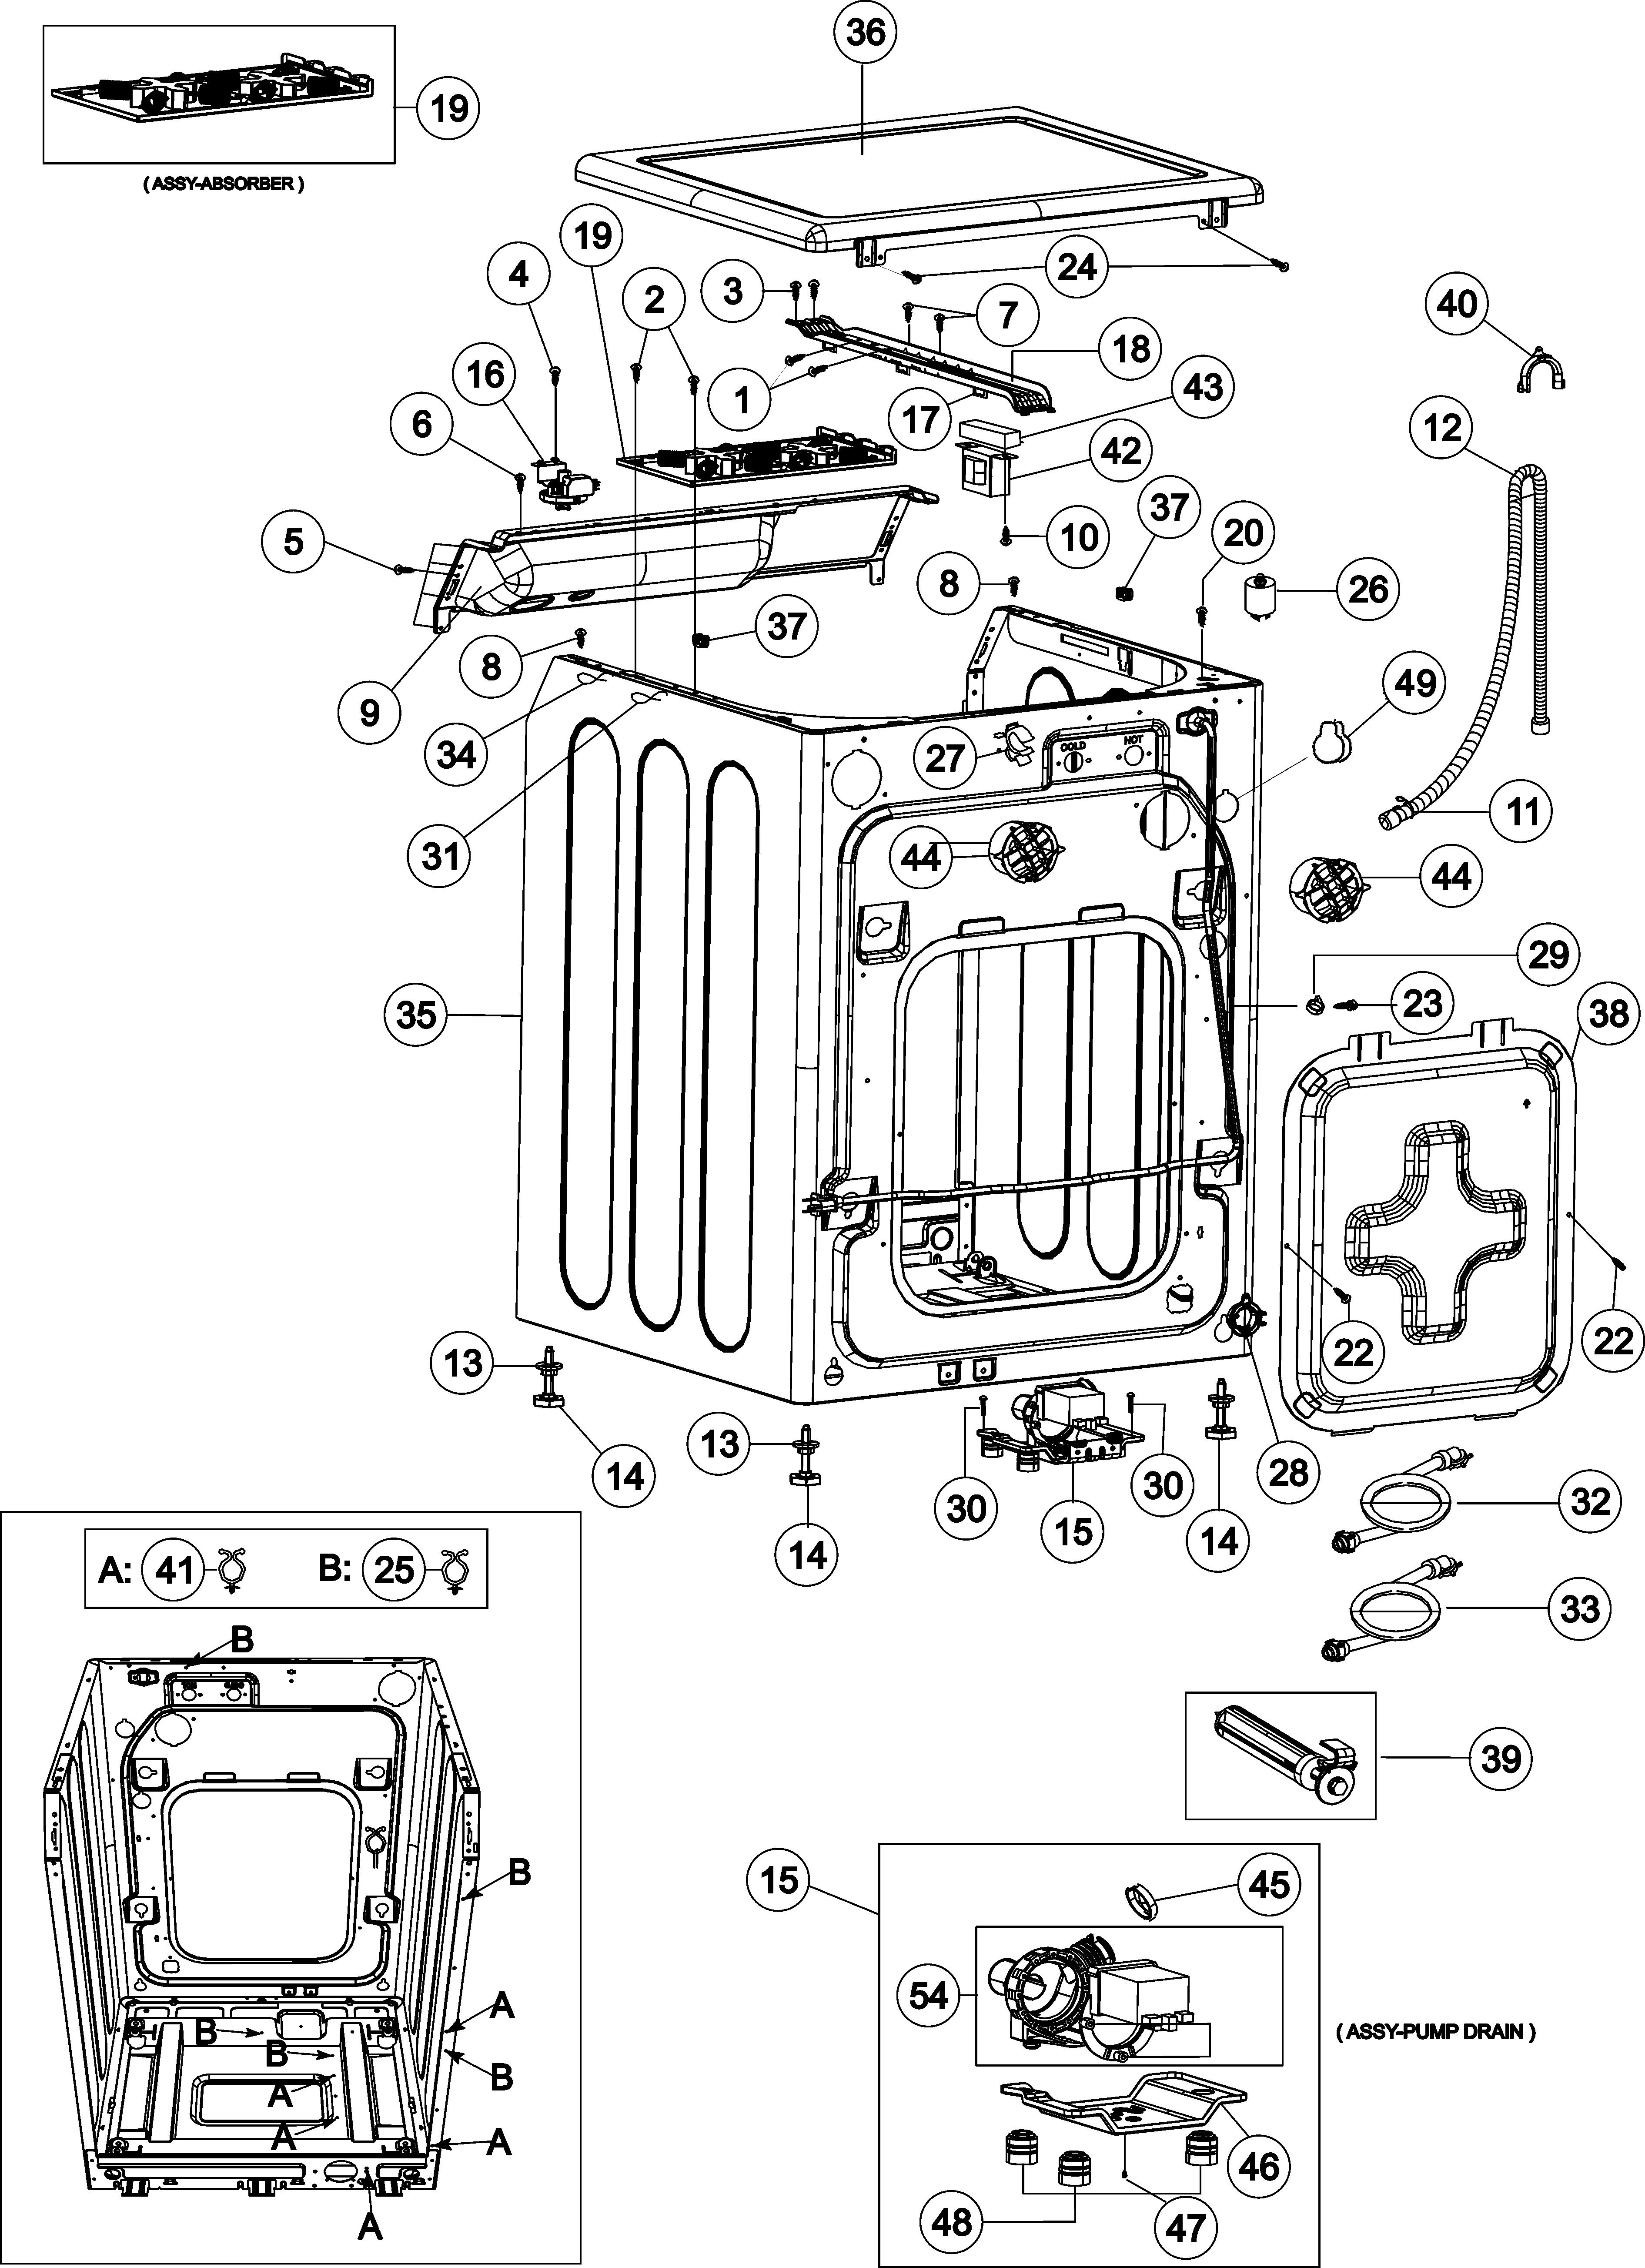 maytag performa washer service manual